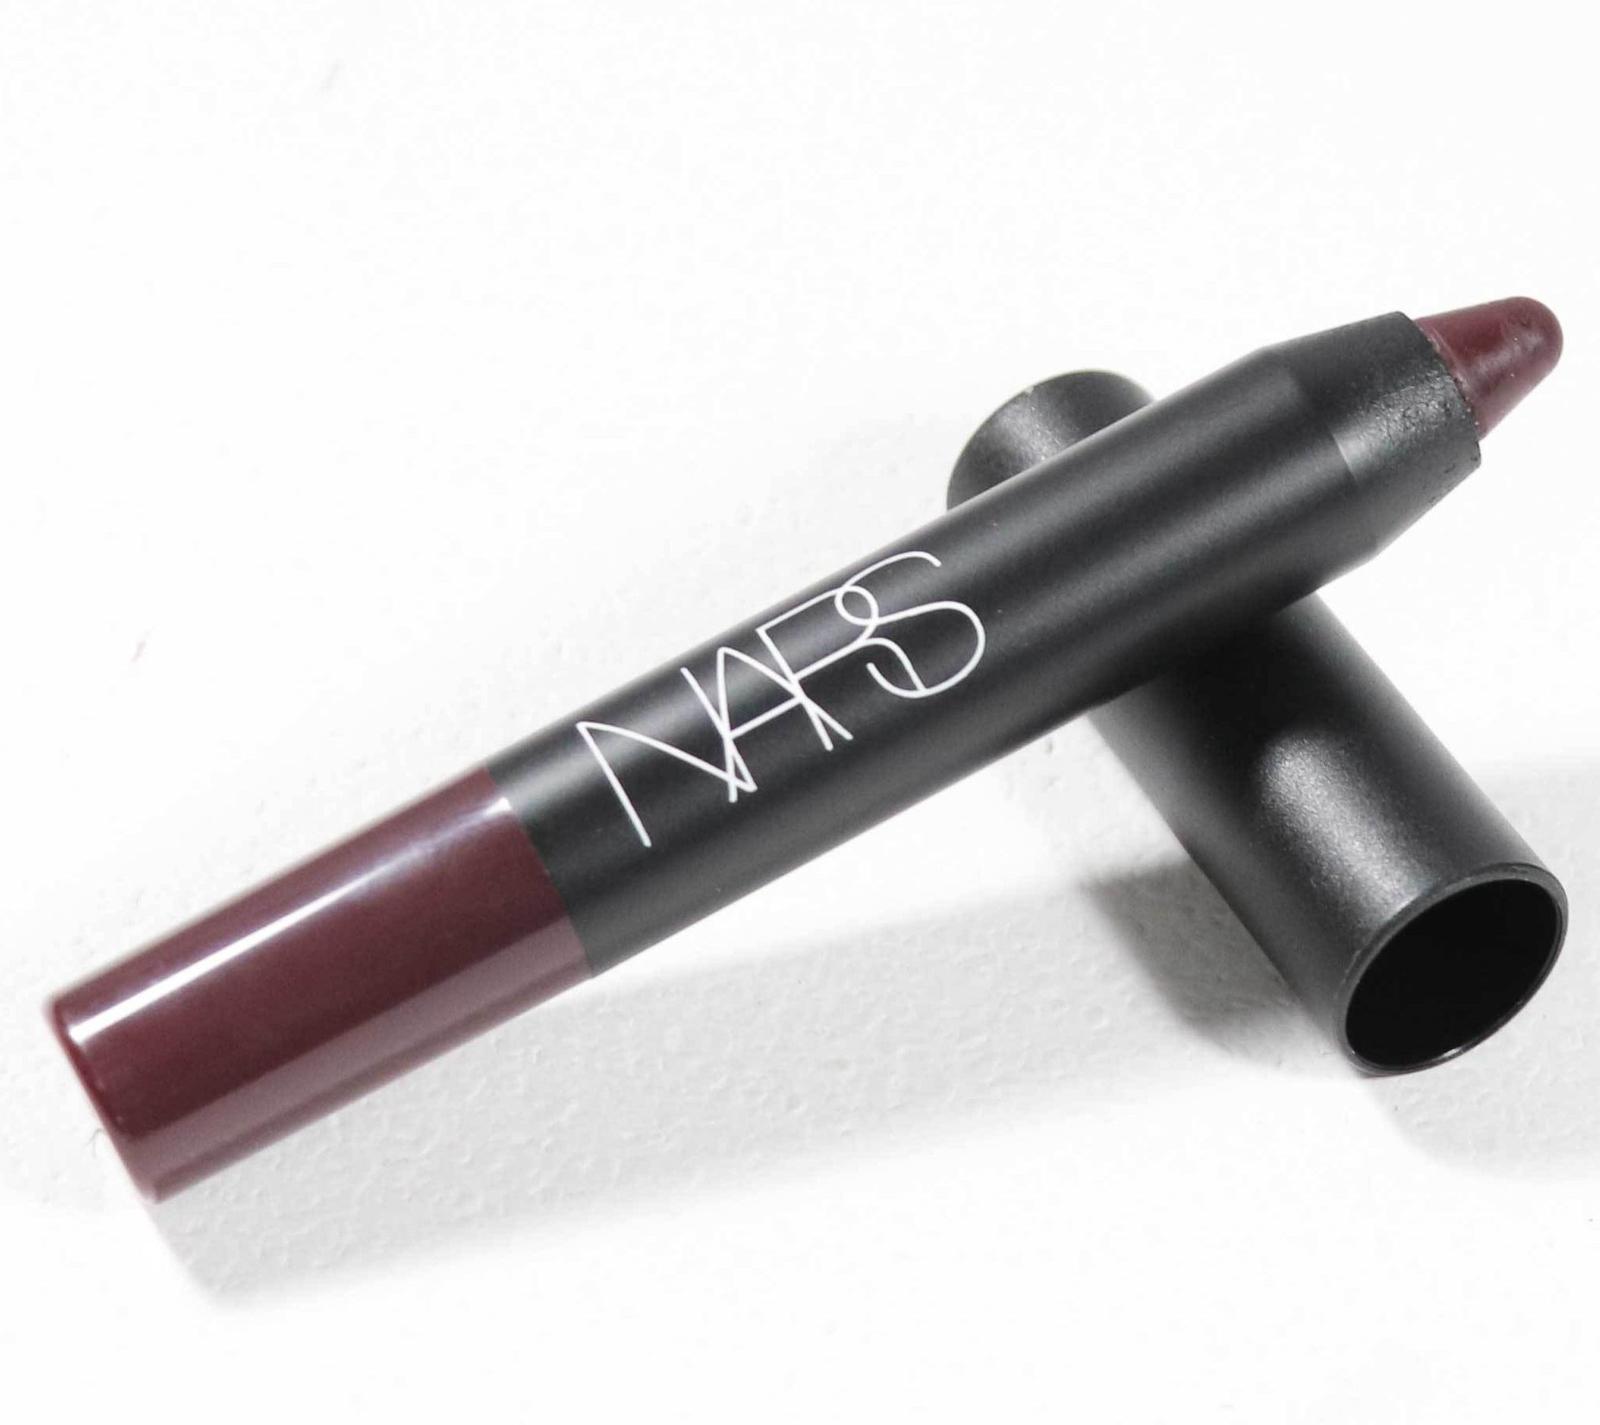 NARS - velvet matte lipstick - Obrázok č. 1